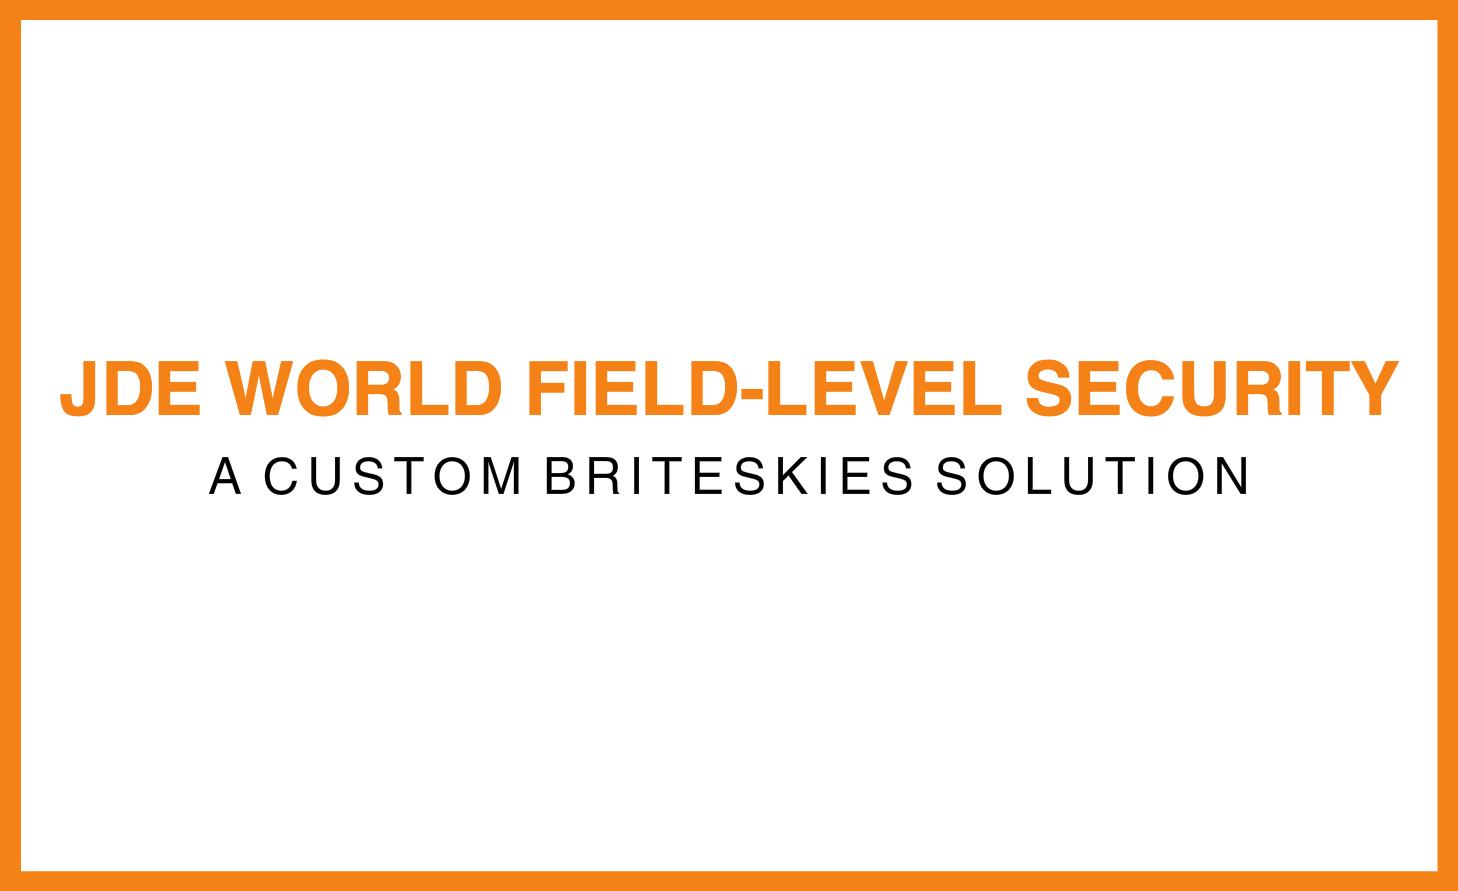 jde_field-level_security.png